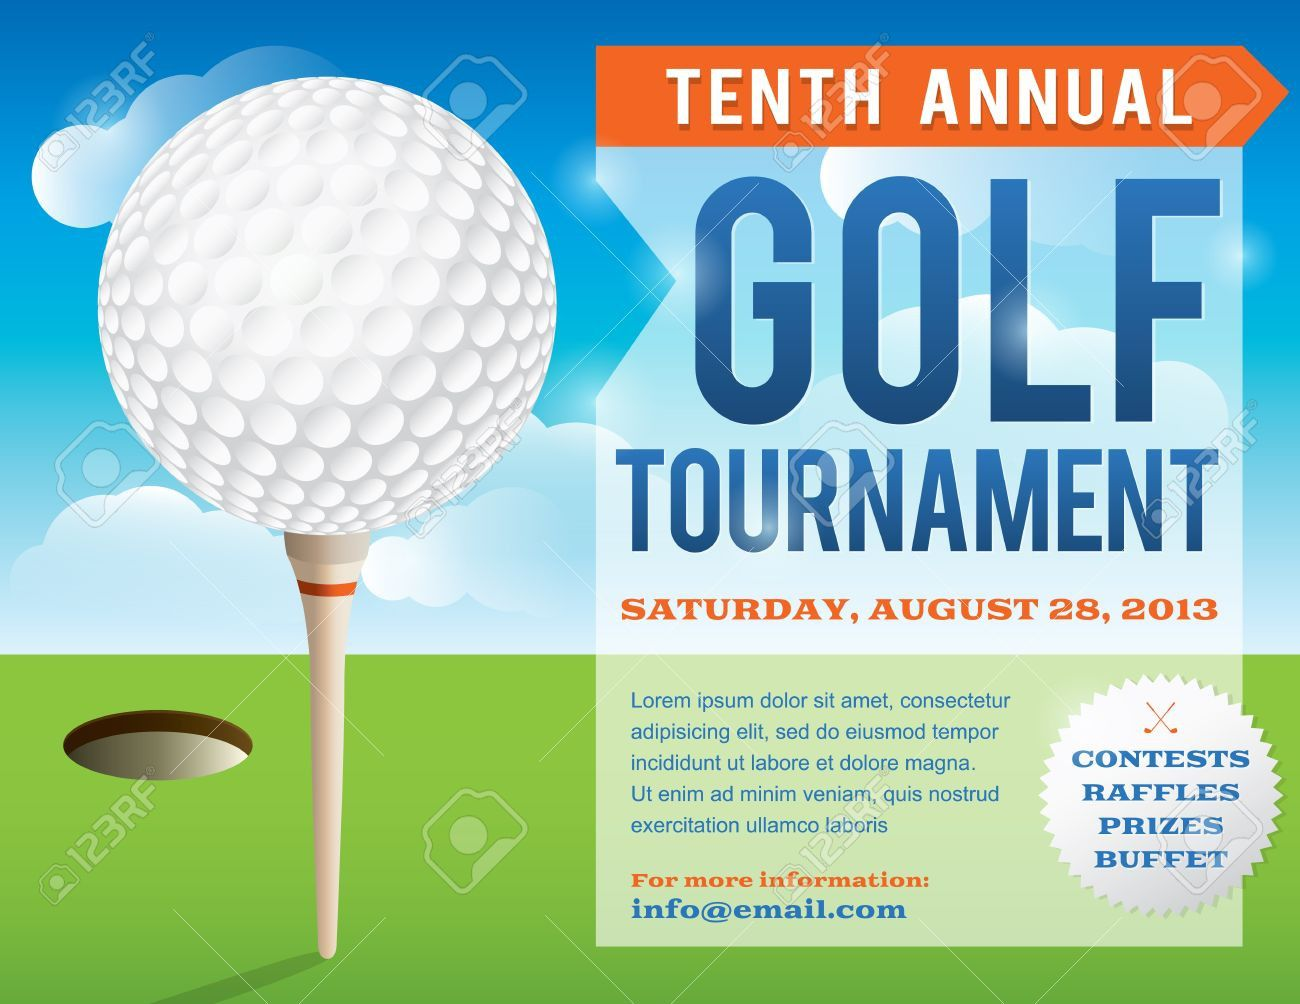 Golf Invitation Template Free Download Inspirational Golf Invitations Templates Free Papaki C Golf Tournament Golf Invitation Invitation Template